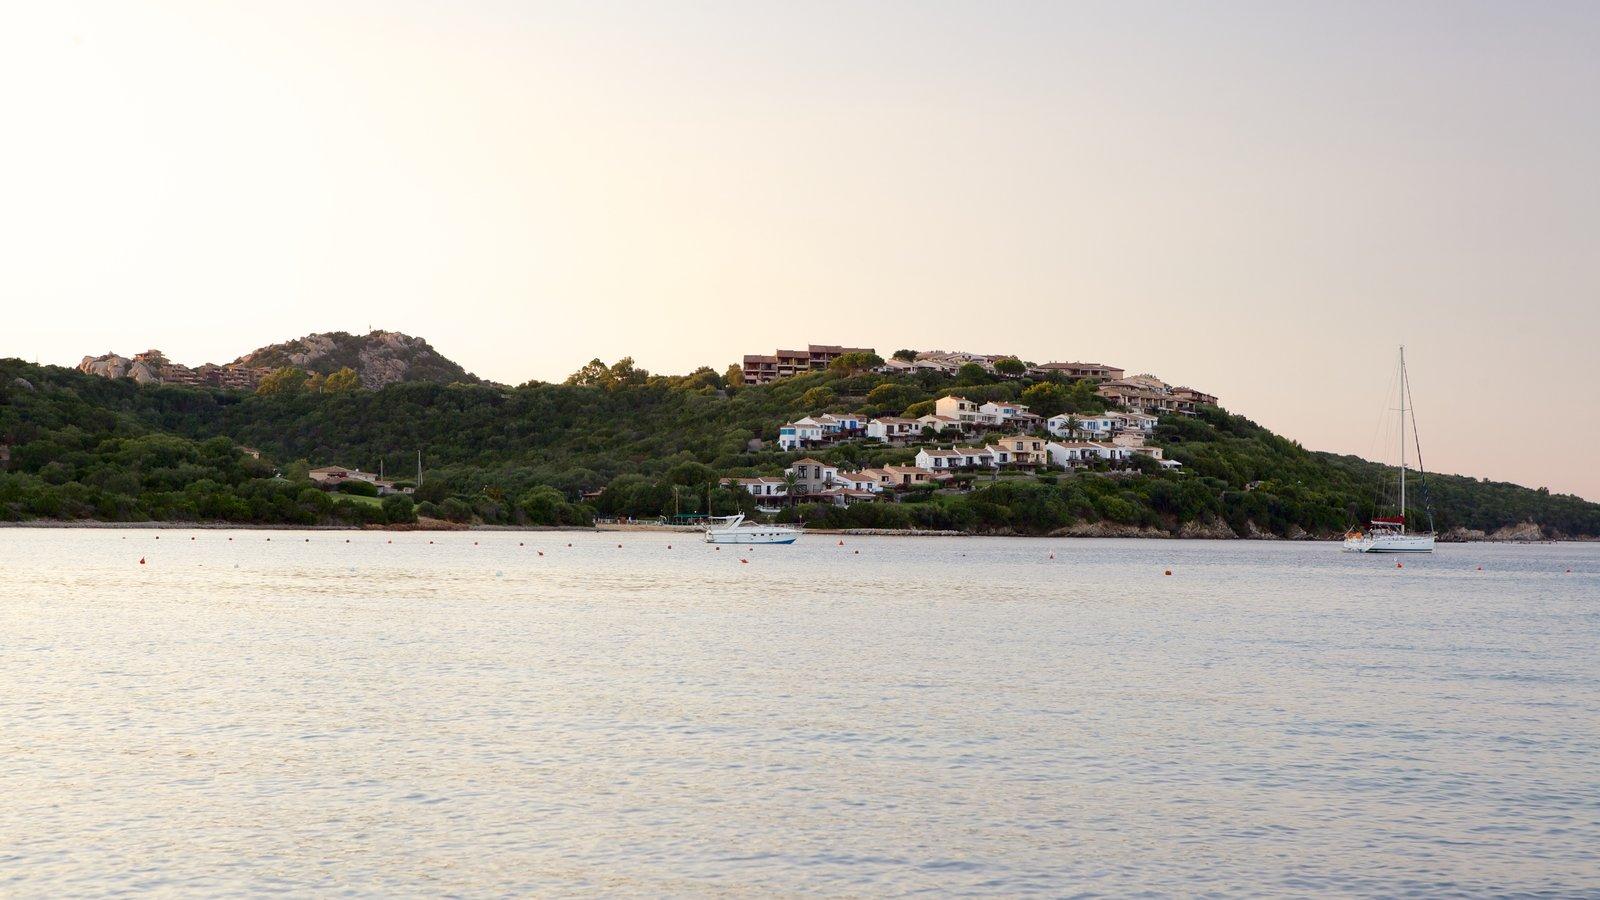 La Marinella Beach featuring boating, general coastal views and a coastal town